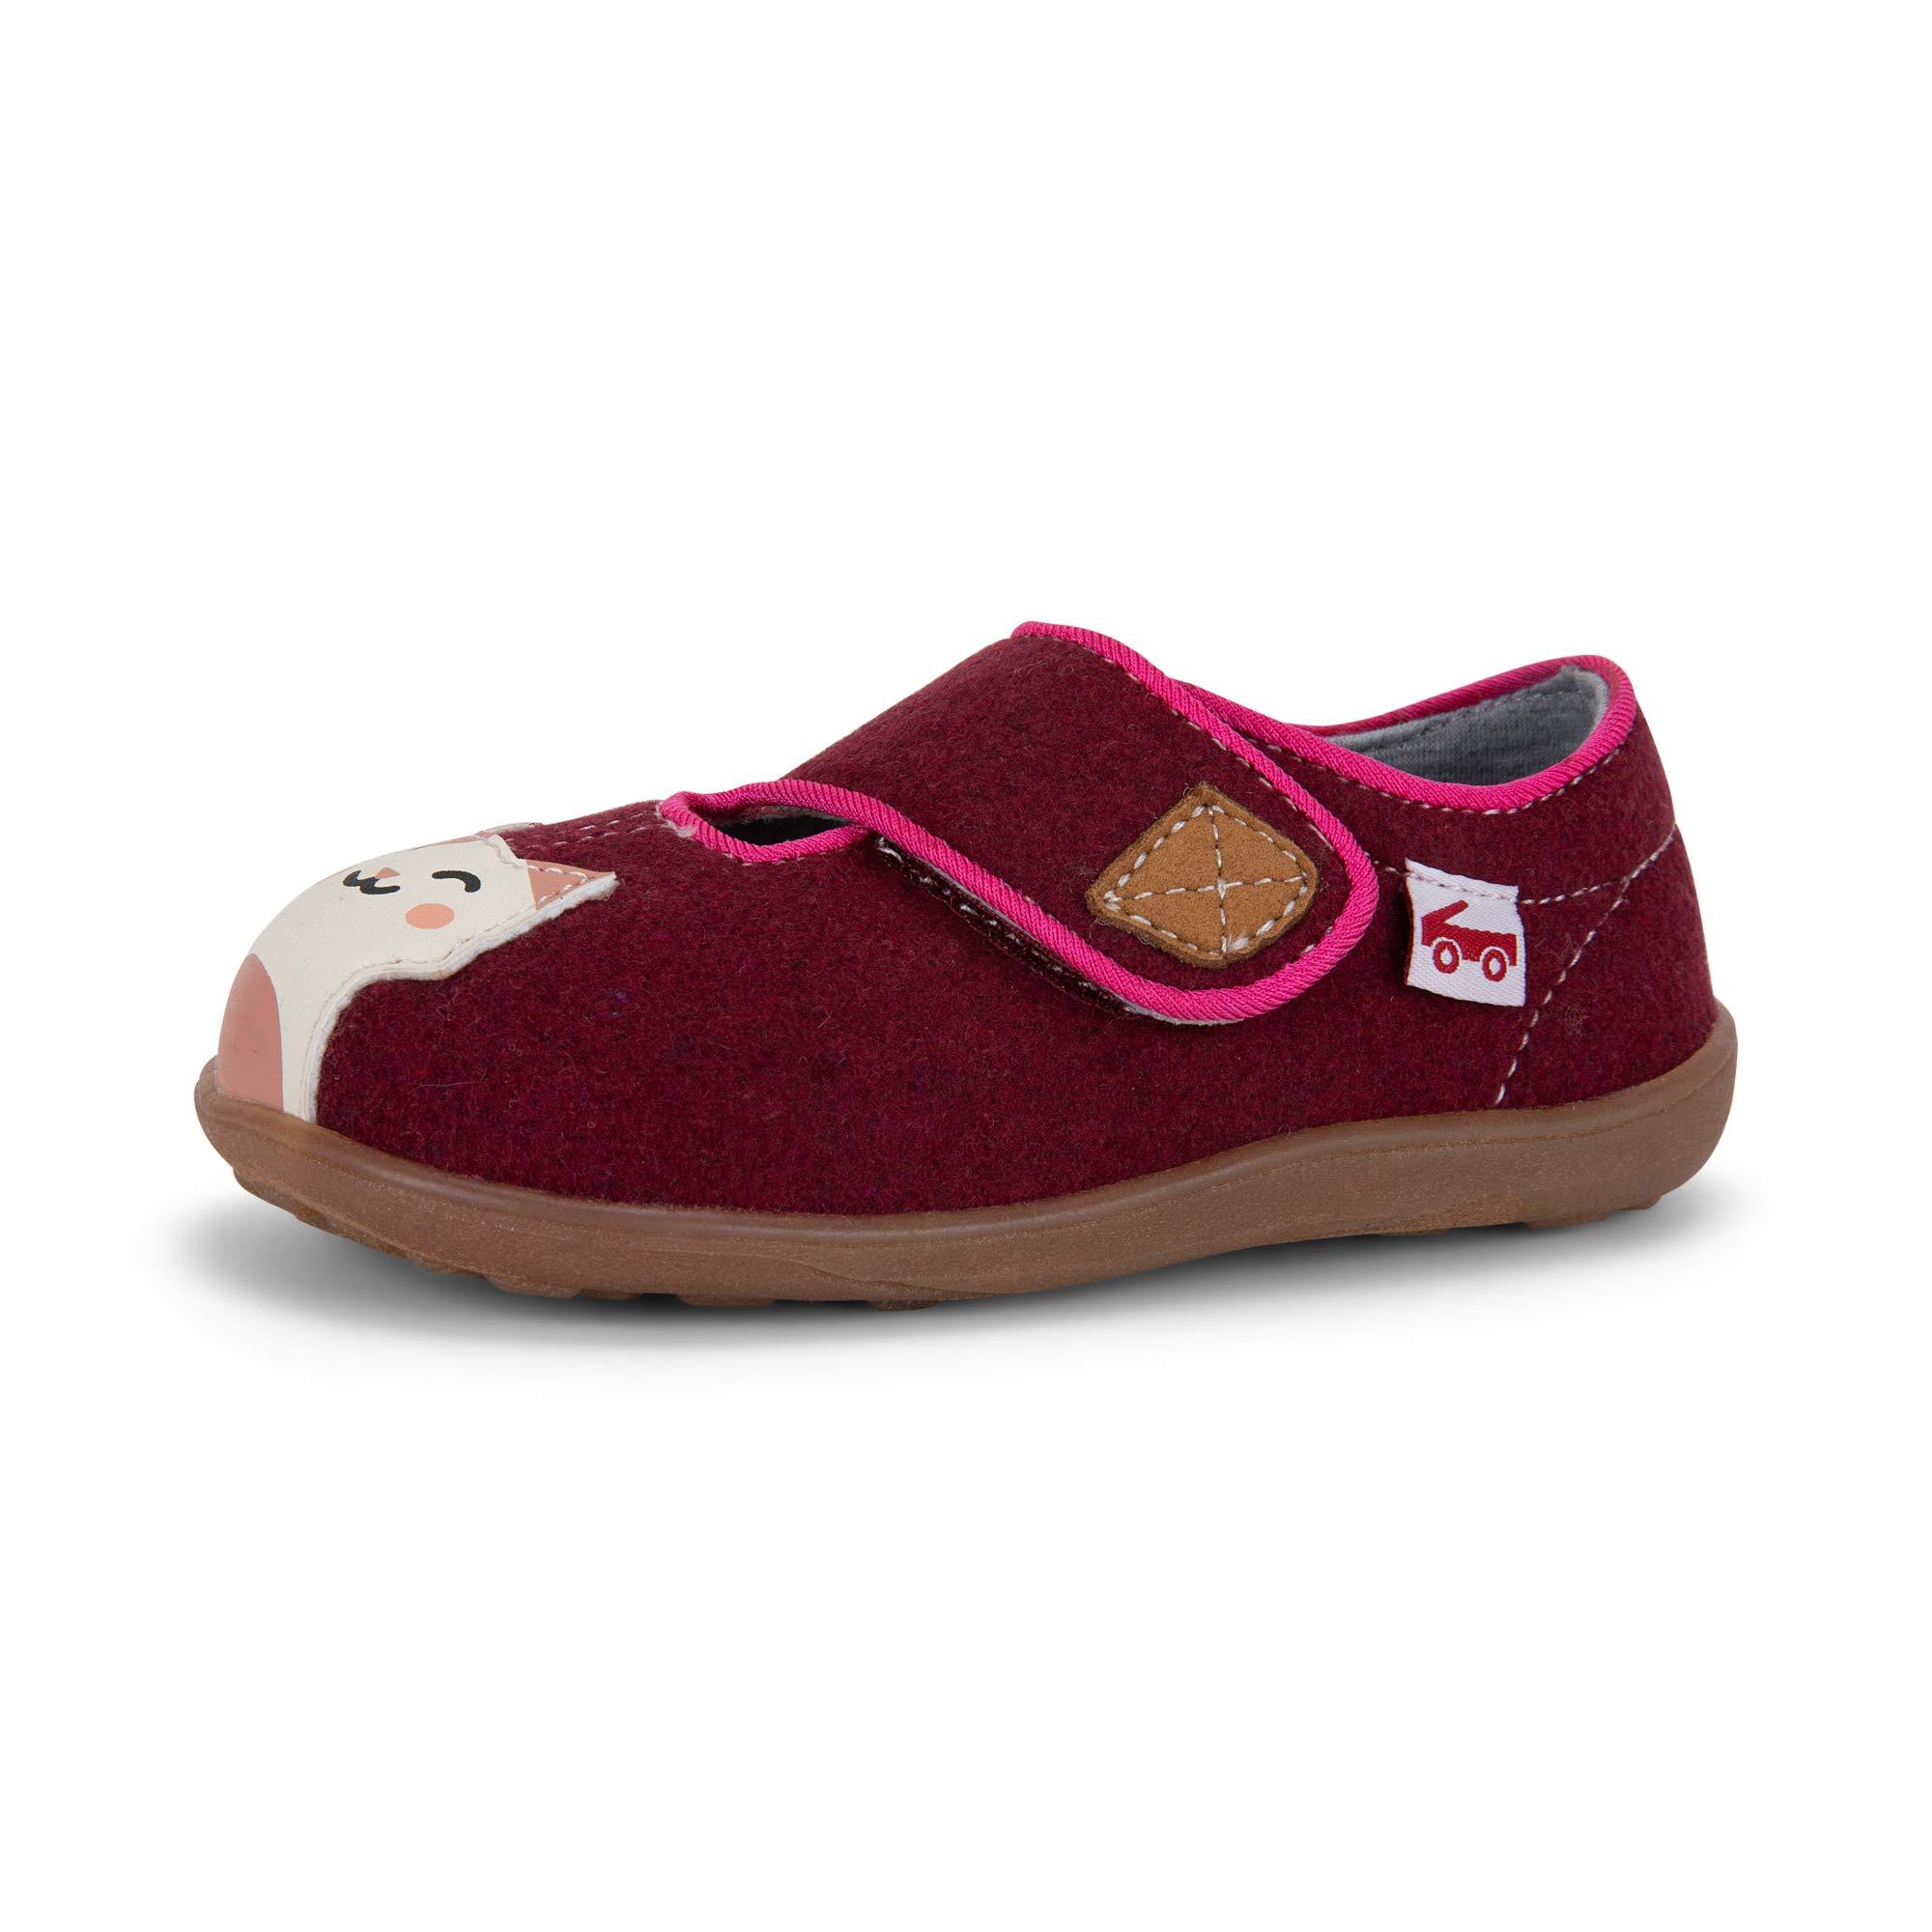 See Kai Run - Cruz II Slippers for Kids, Berry Kitty, 7 by See Kai Run